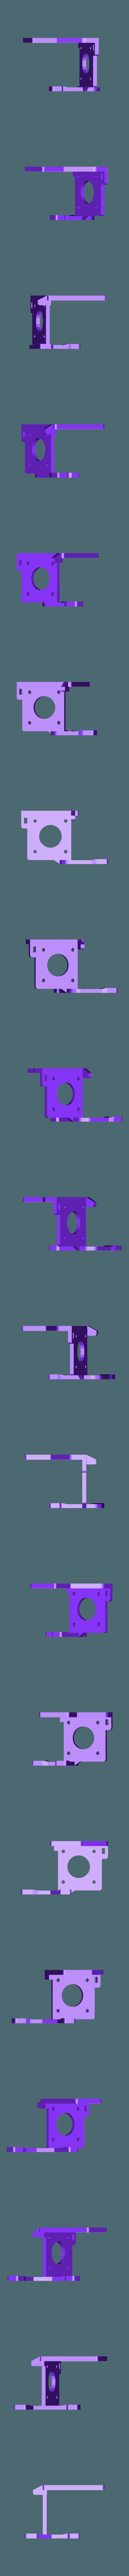 Soporte Extrusor BMG con Hotend V6.stl Télécharger fichier STL gratuit Soporte Hotend Chimera & Cyclops y 2 ventiladores de capa eje X Perfil aluminio 2020 // Soporte BMG + Hotend V6 • Objet pour impression 3D, celtarra12